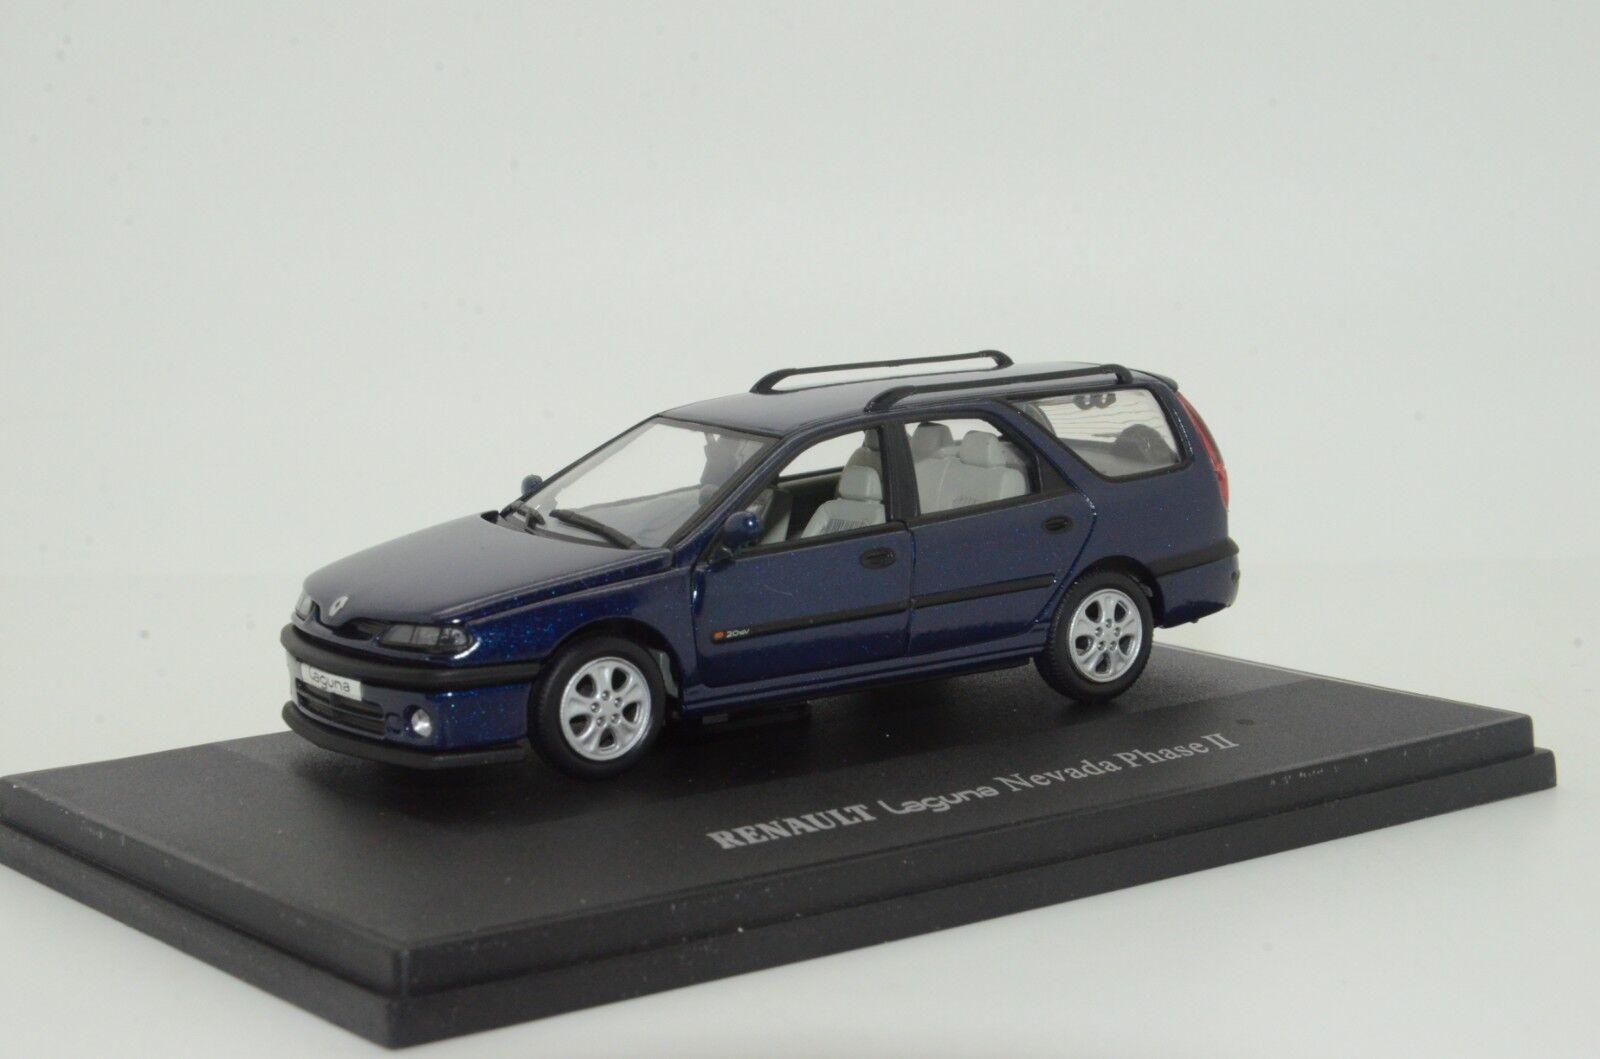 Renault Laguna Nevada Phase II UH 2544 1 43